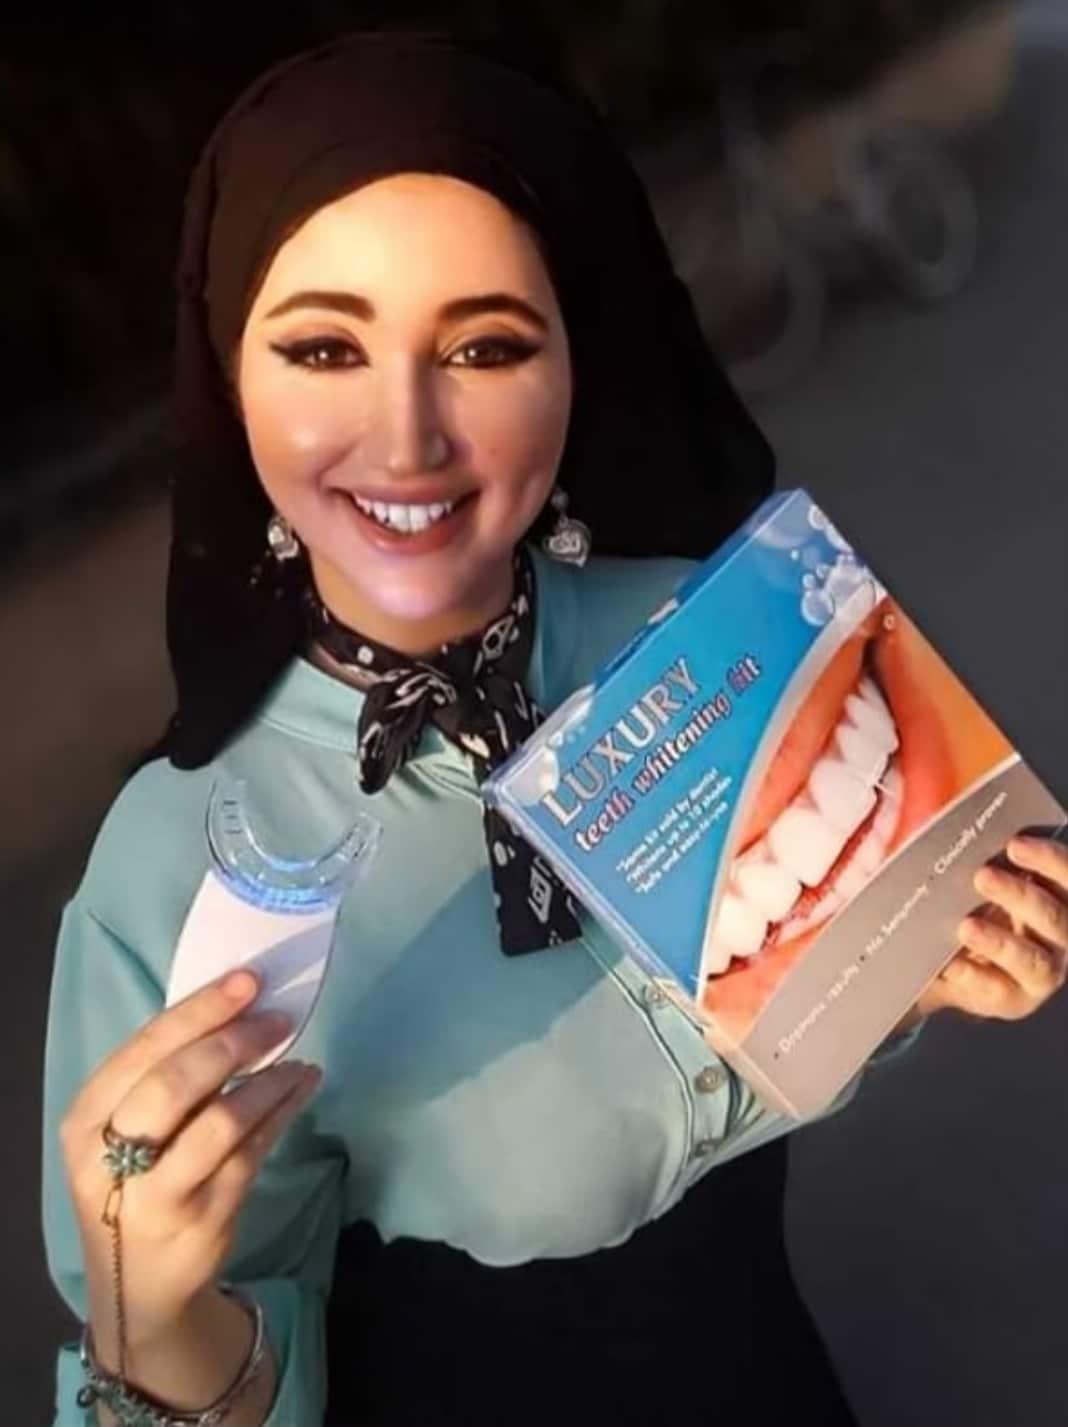 itsalma m. review tandenbleekset